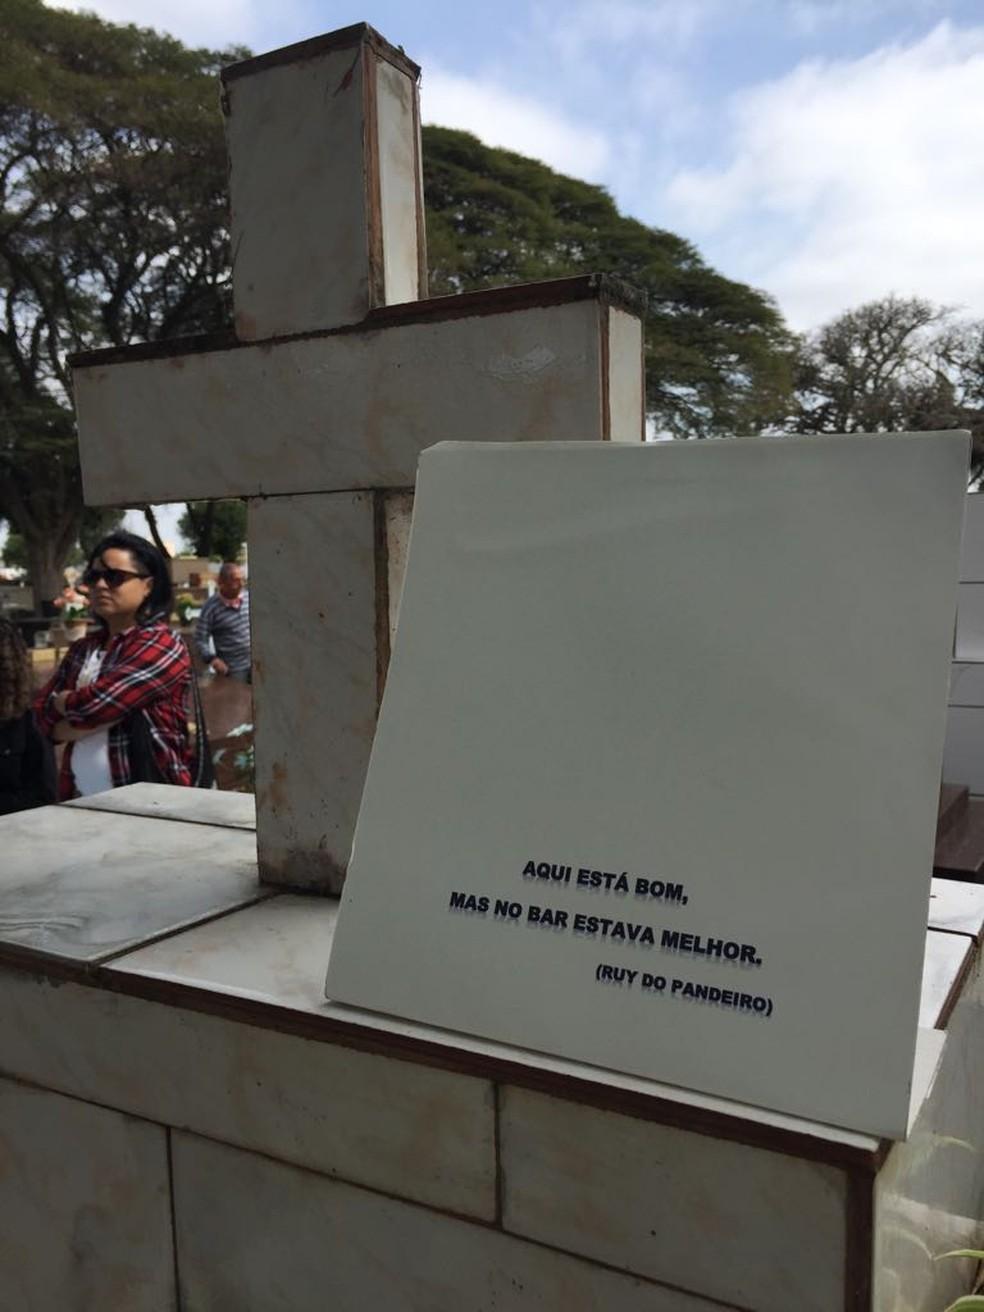 Frase escrita por Ruy ainda em vida para deixar no túmulo (Foto: Vanessa Vantine/TV Vanguarda)